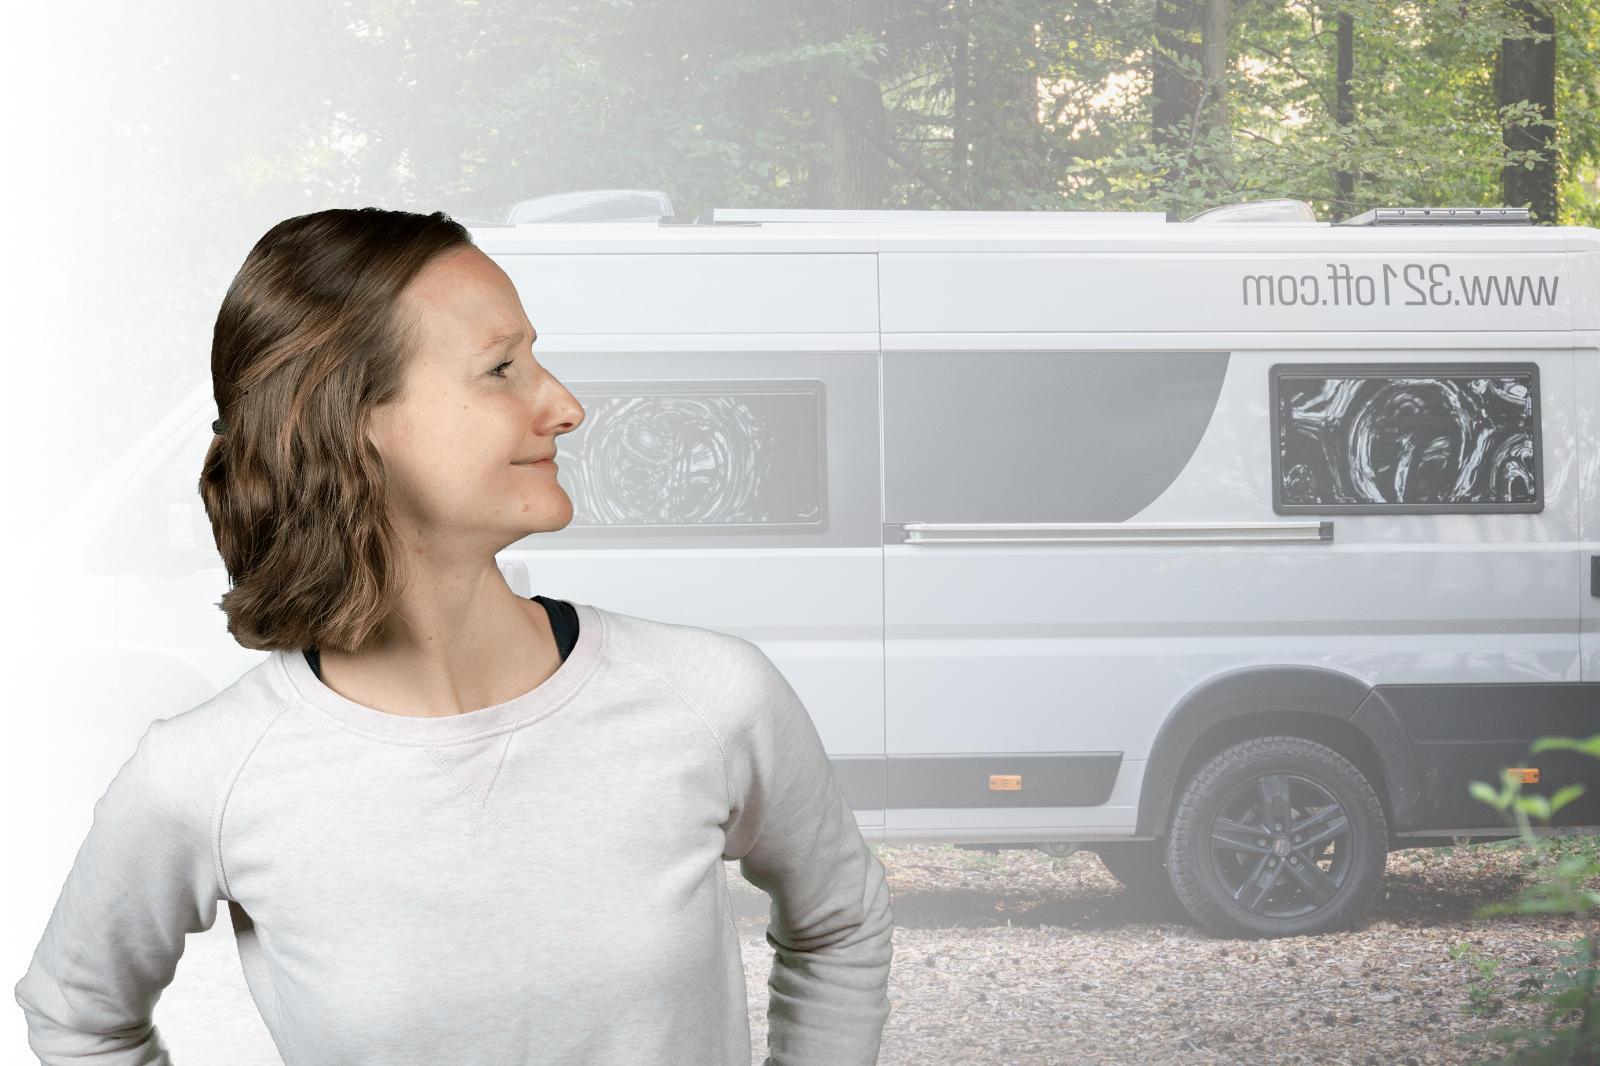 Kfz Steuer Wohnmobil - Erhöhung ab 10? - 10off.com